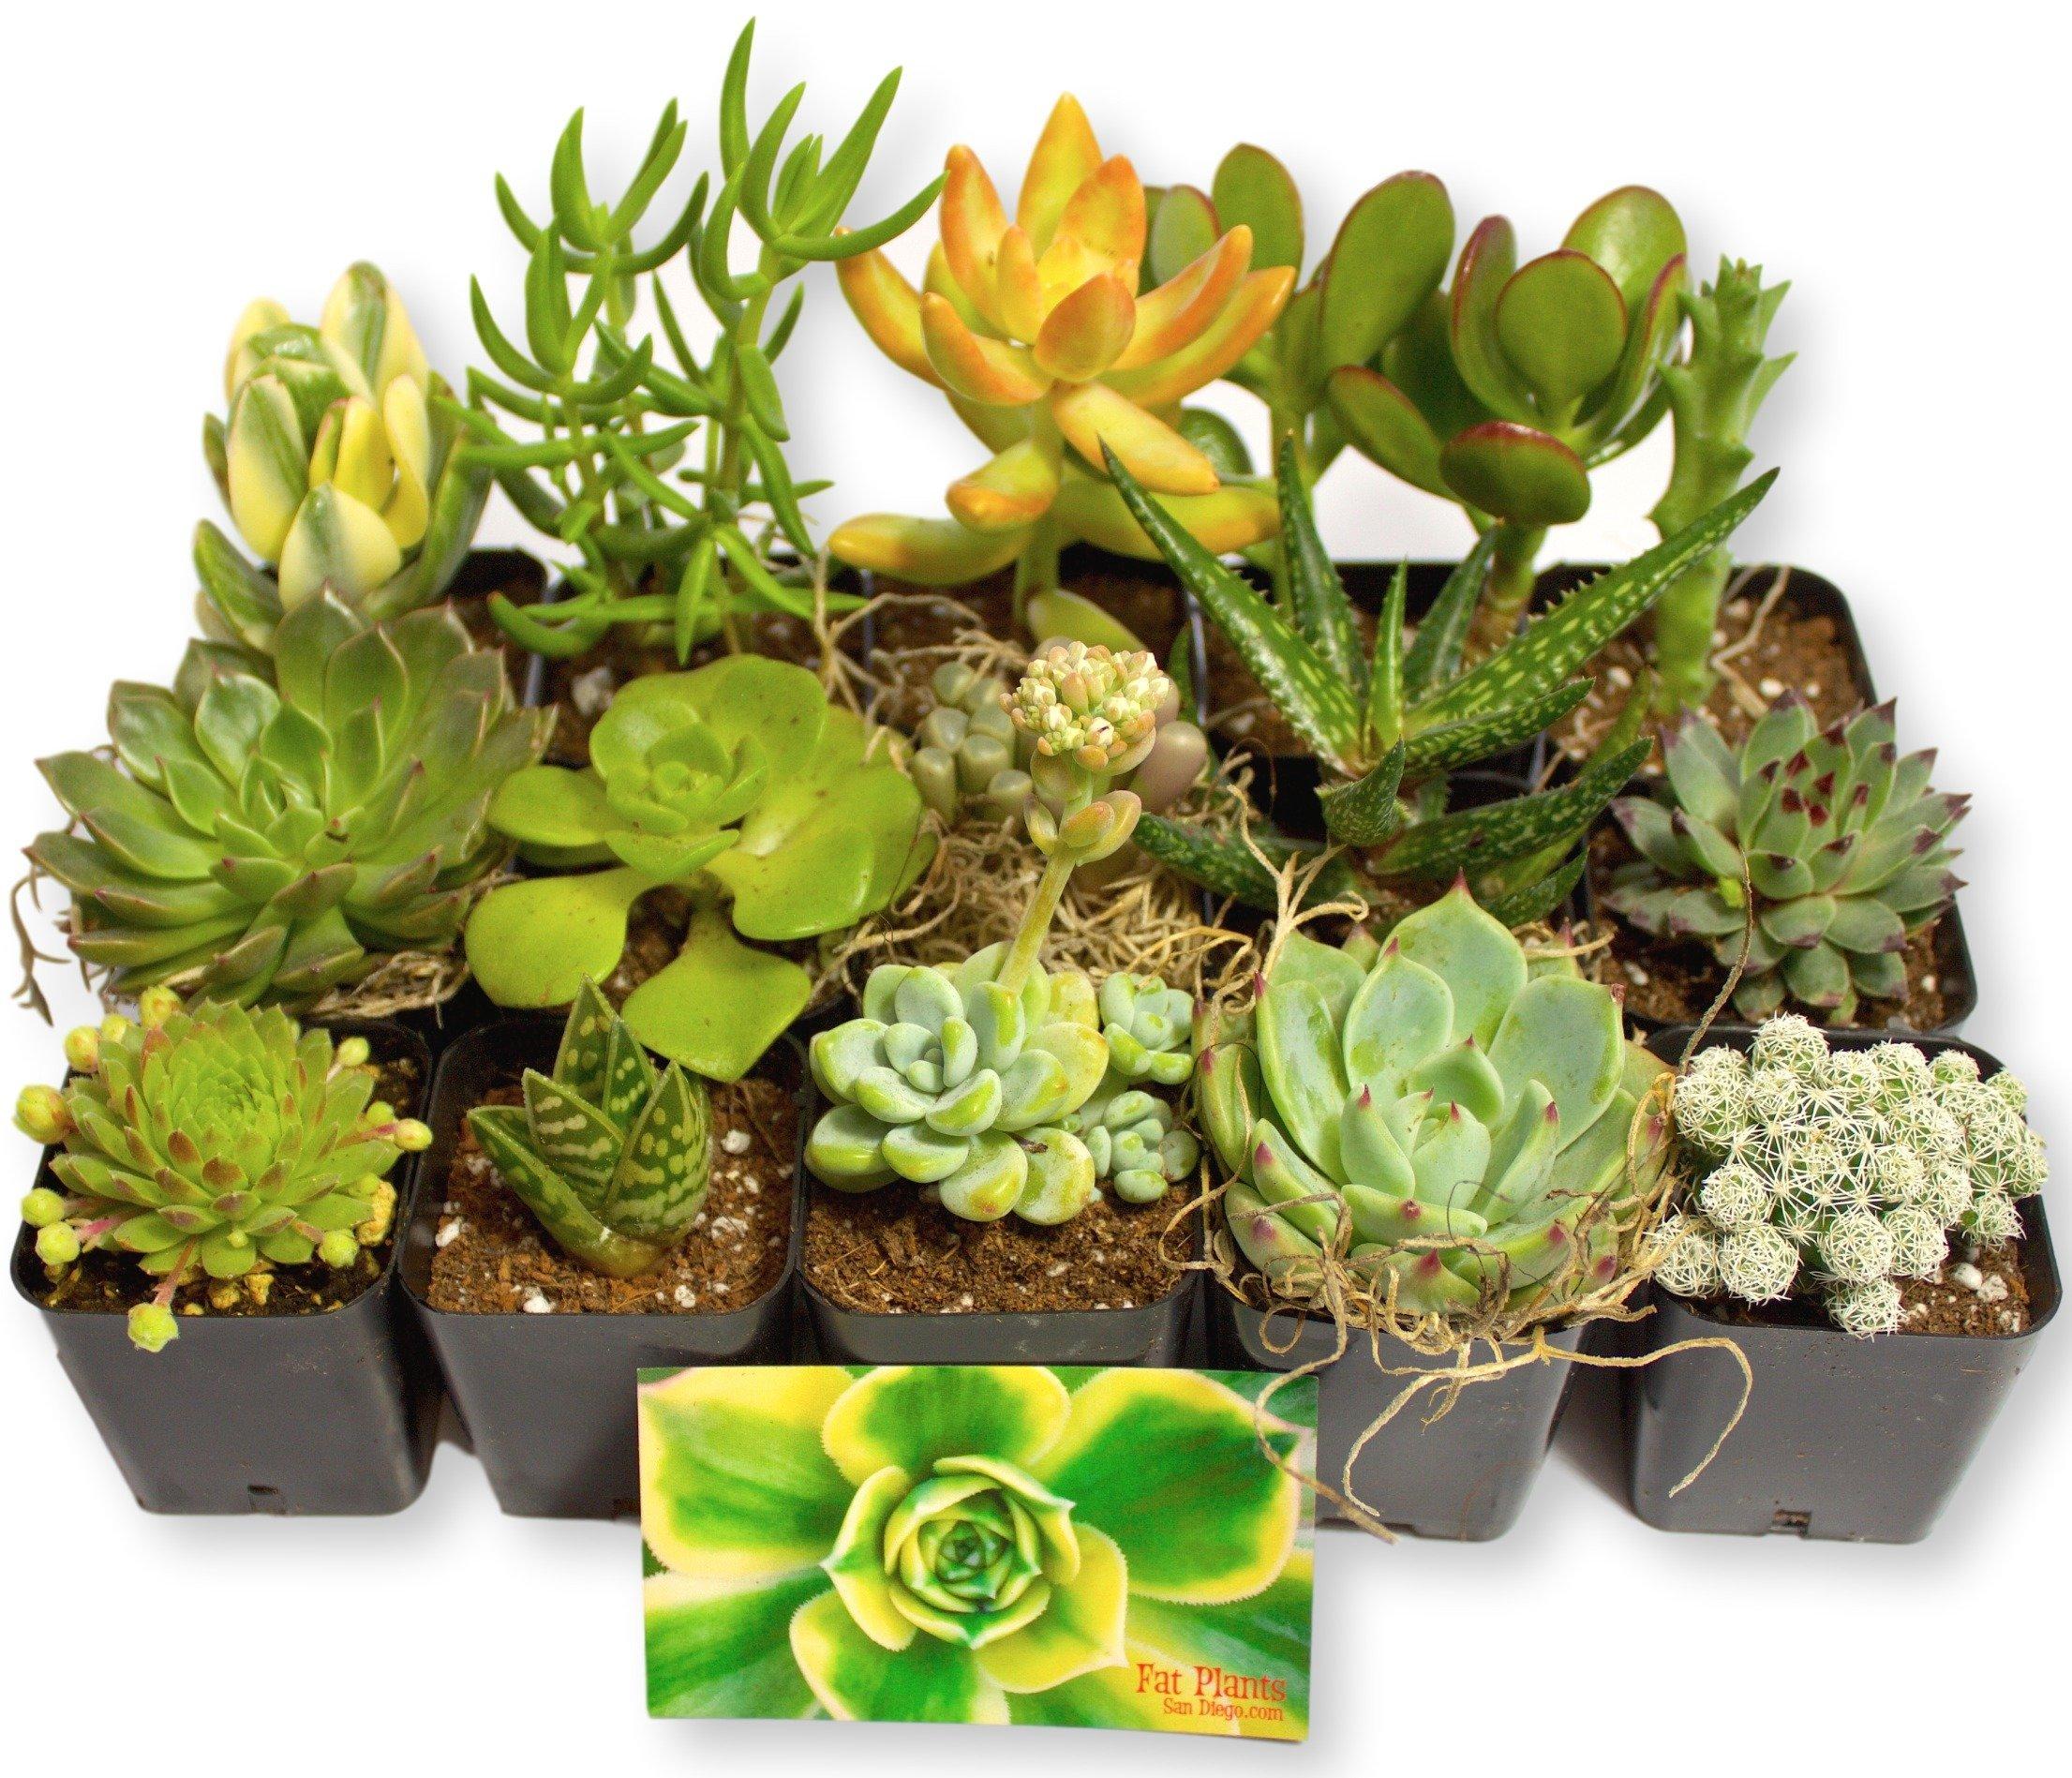 Fat Plants San Diego Miniature Living Succulent Plants in Plastic Planter Pots with Soil by Fat Plants San Diego